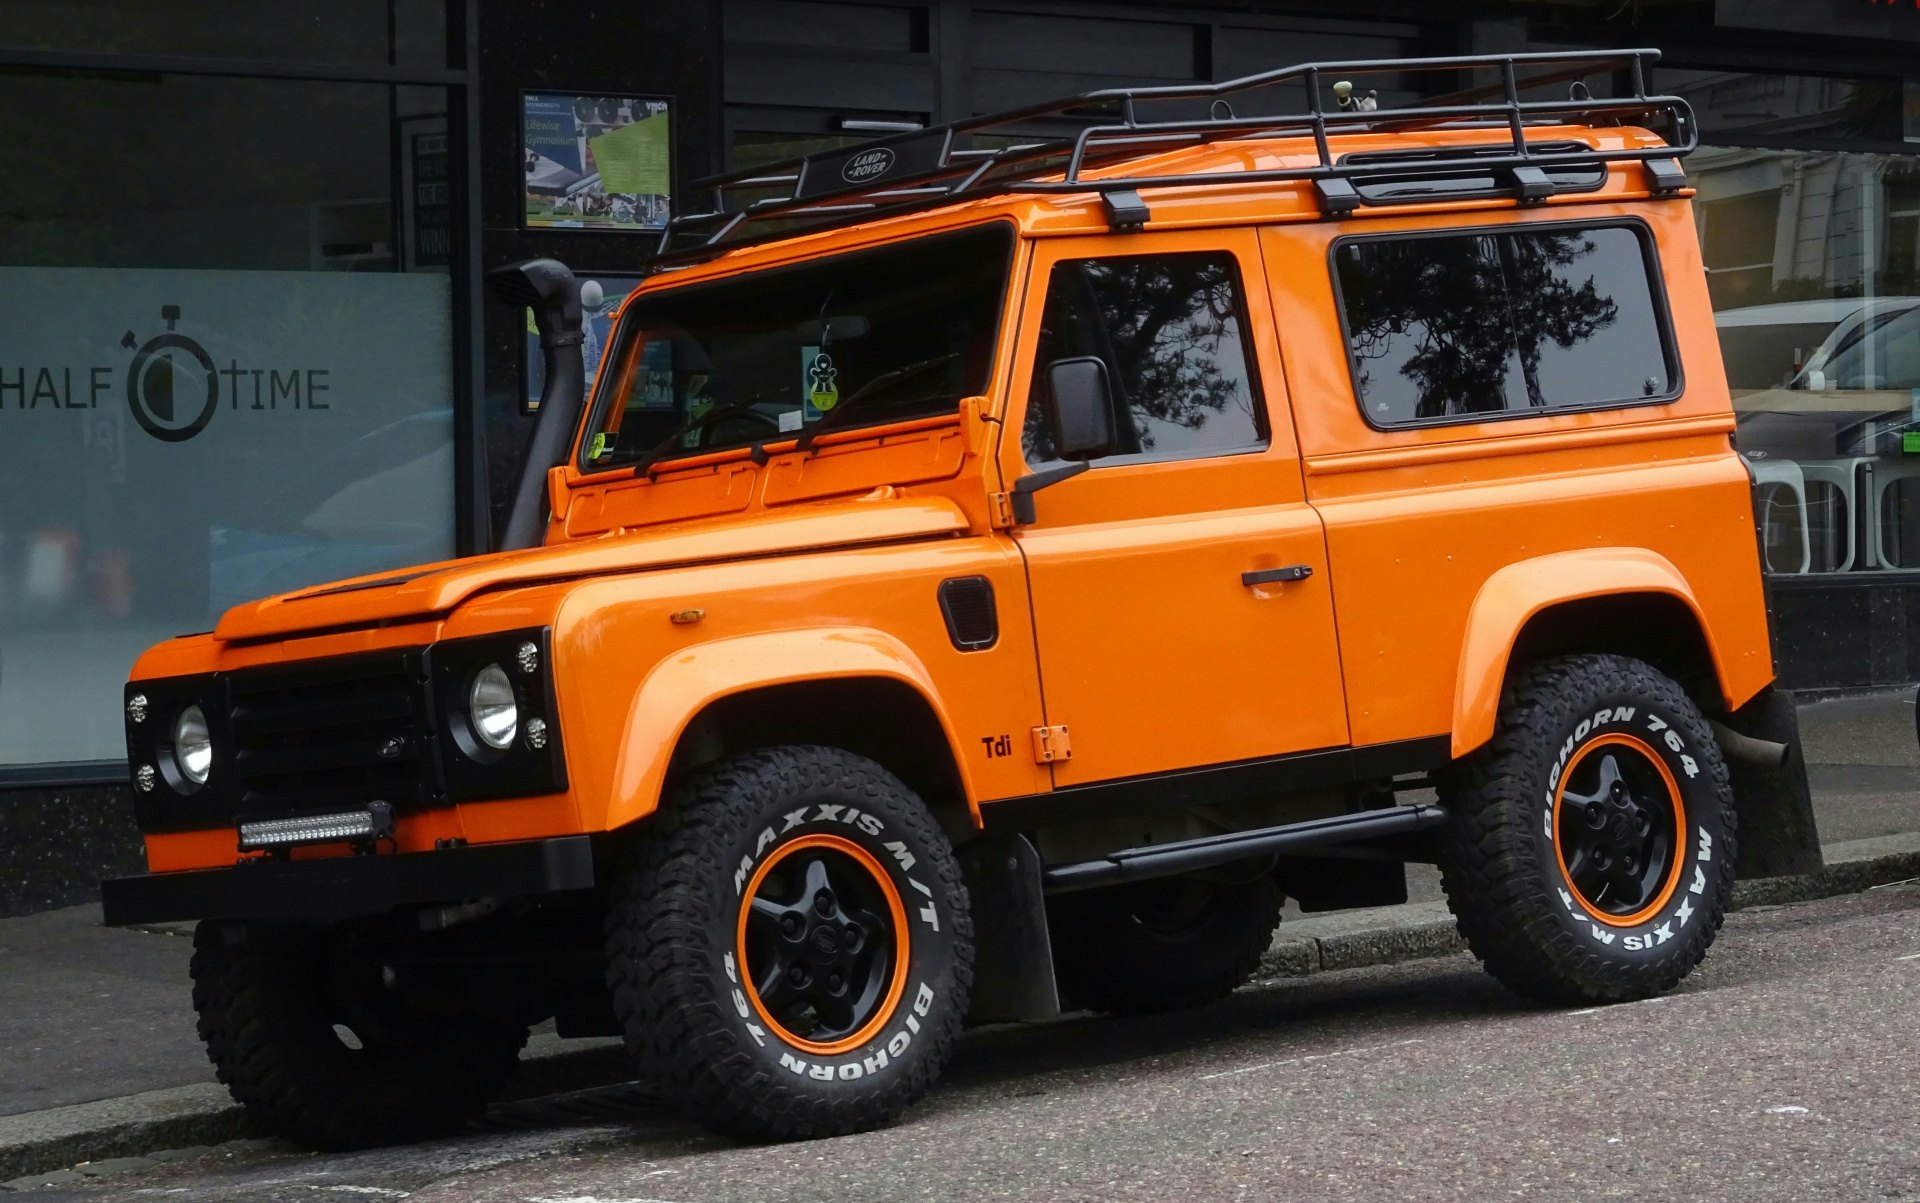 Orange Land Rover Defender Jeep Free Stock Public Domain